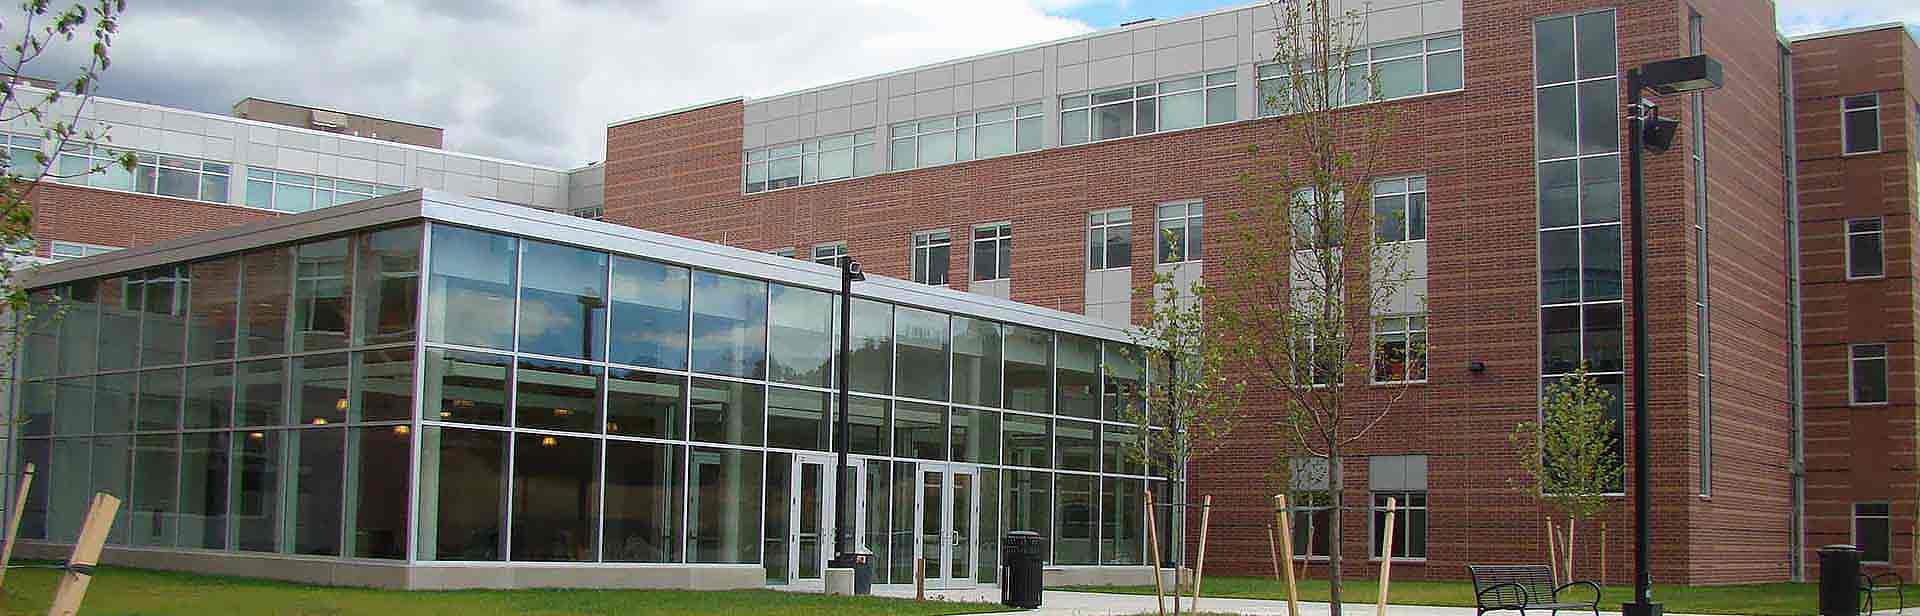 Educatius-NewtonSouthPublicSchools-MA-Building-Banner-2019